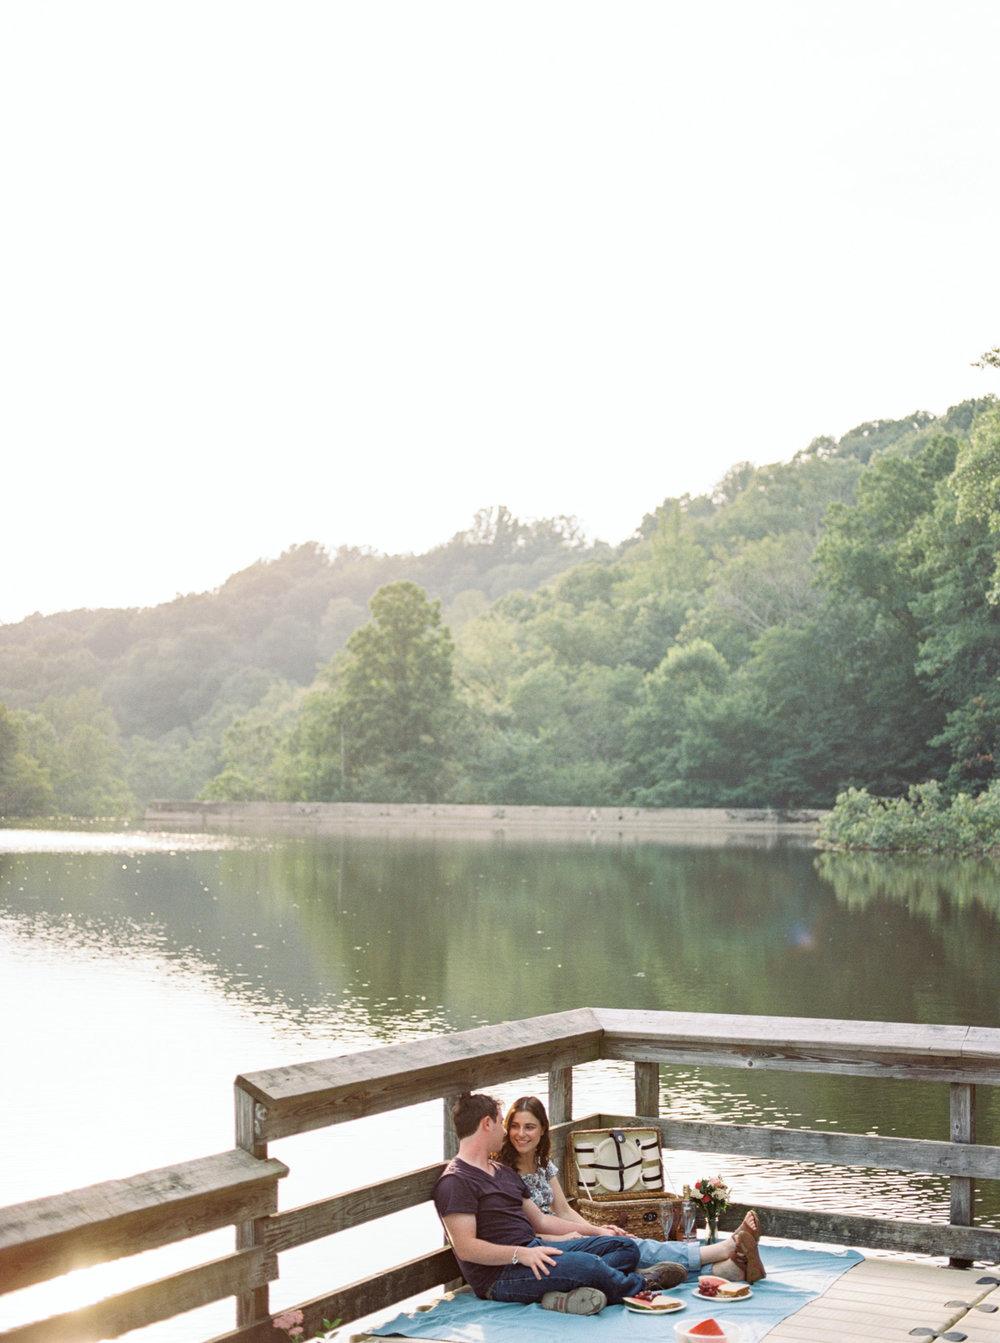 Akron Park Engagement Photos by Cleveland Wedding Photographer Matt Erickson Photography